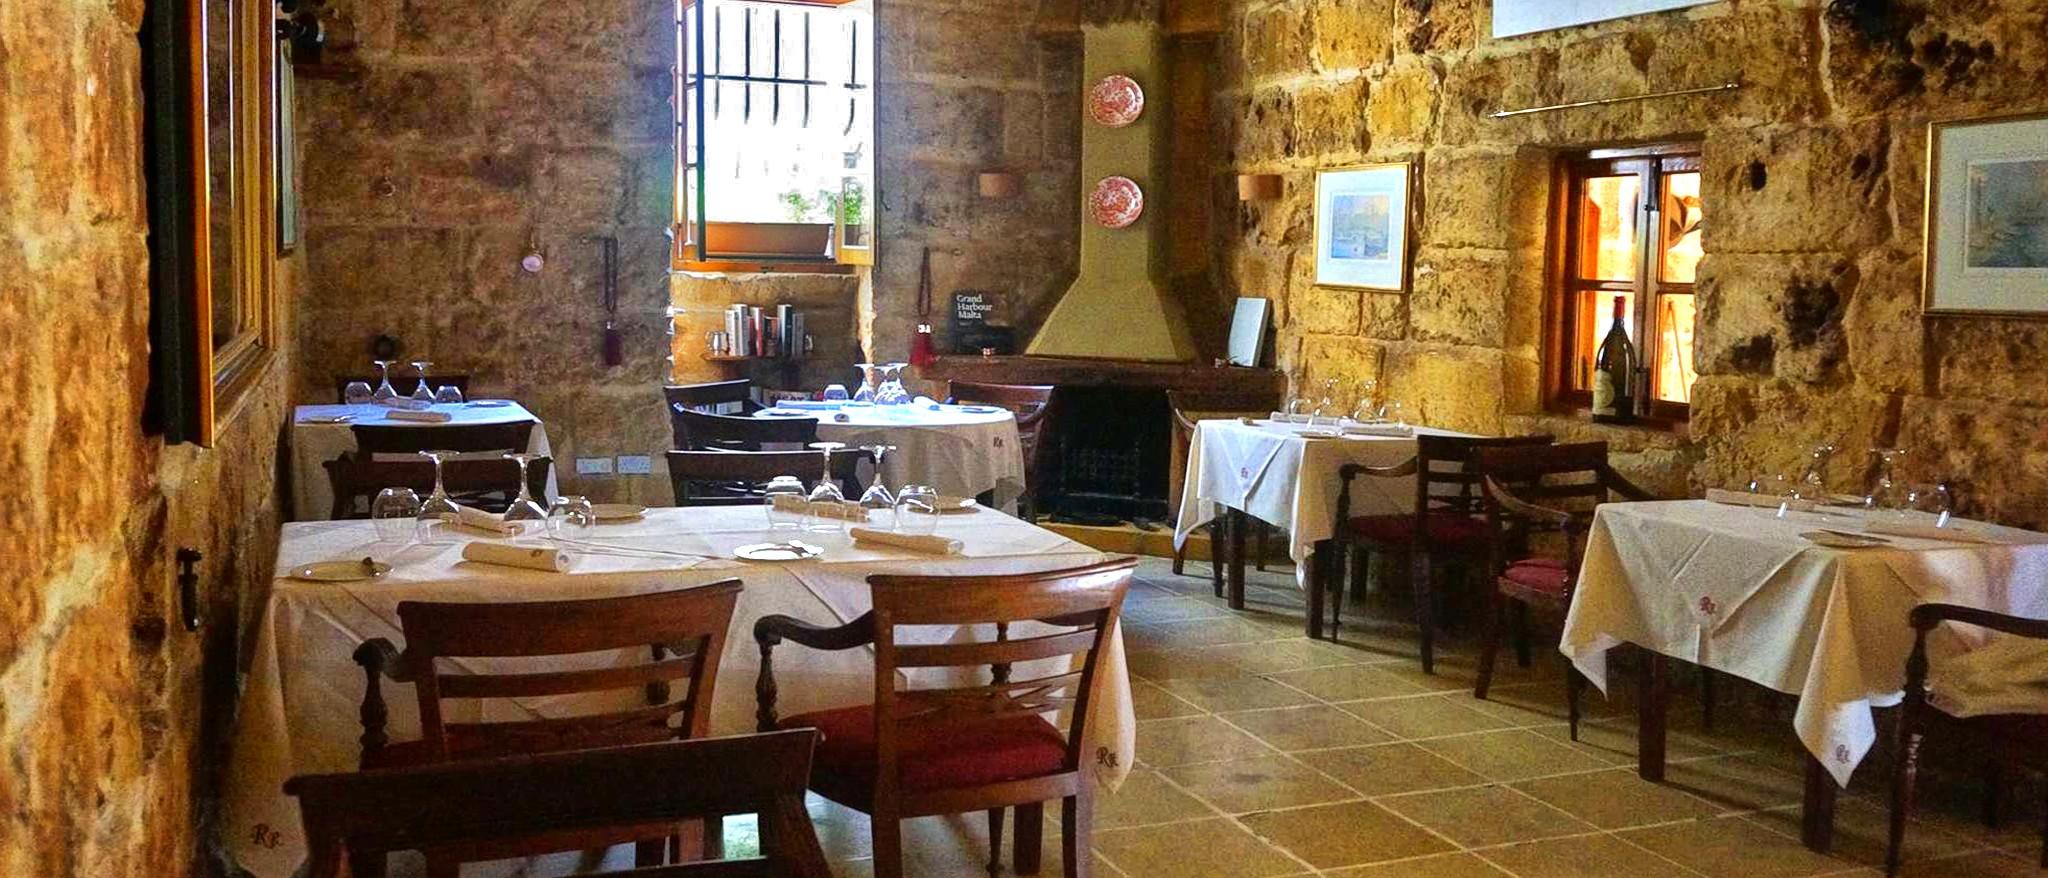 Rebekah S Restaurant Malta Dine Malta